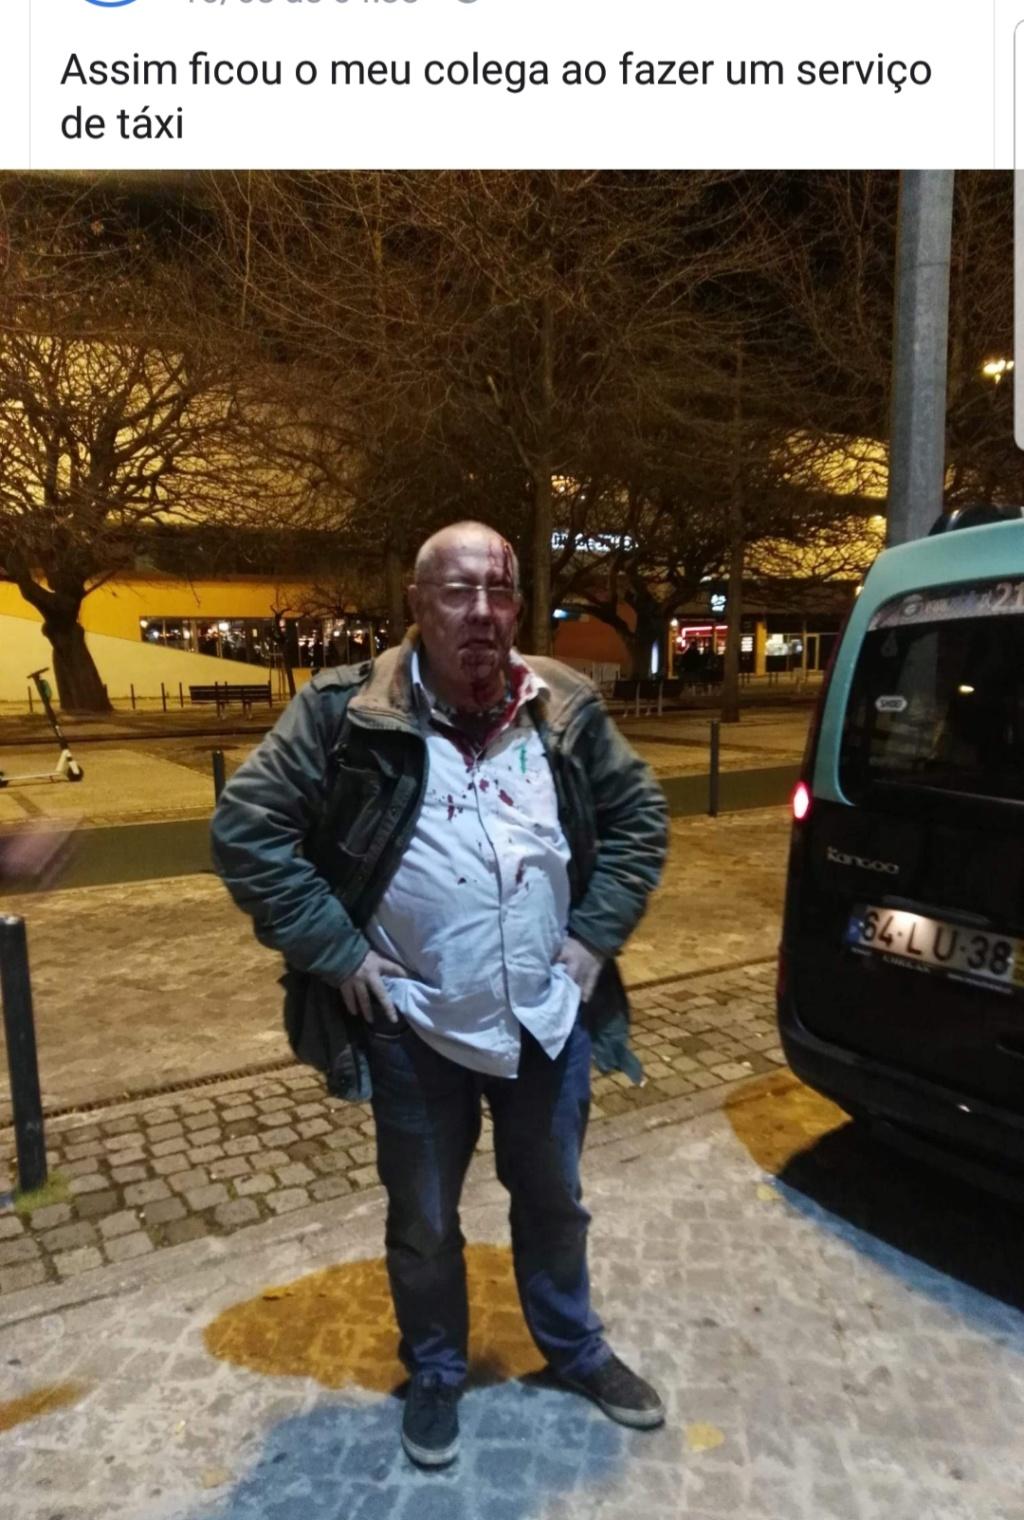 Ahhh ... os portugueses são racistas e xenófobos! 20190315